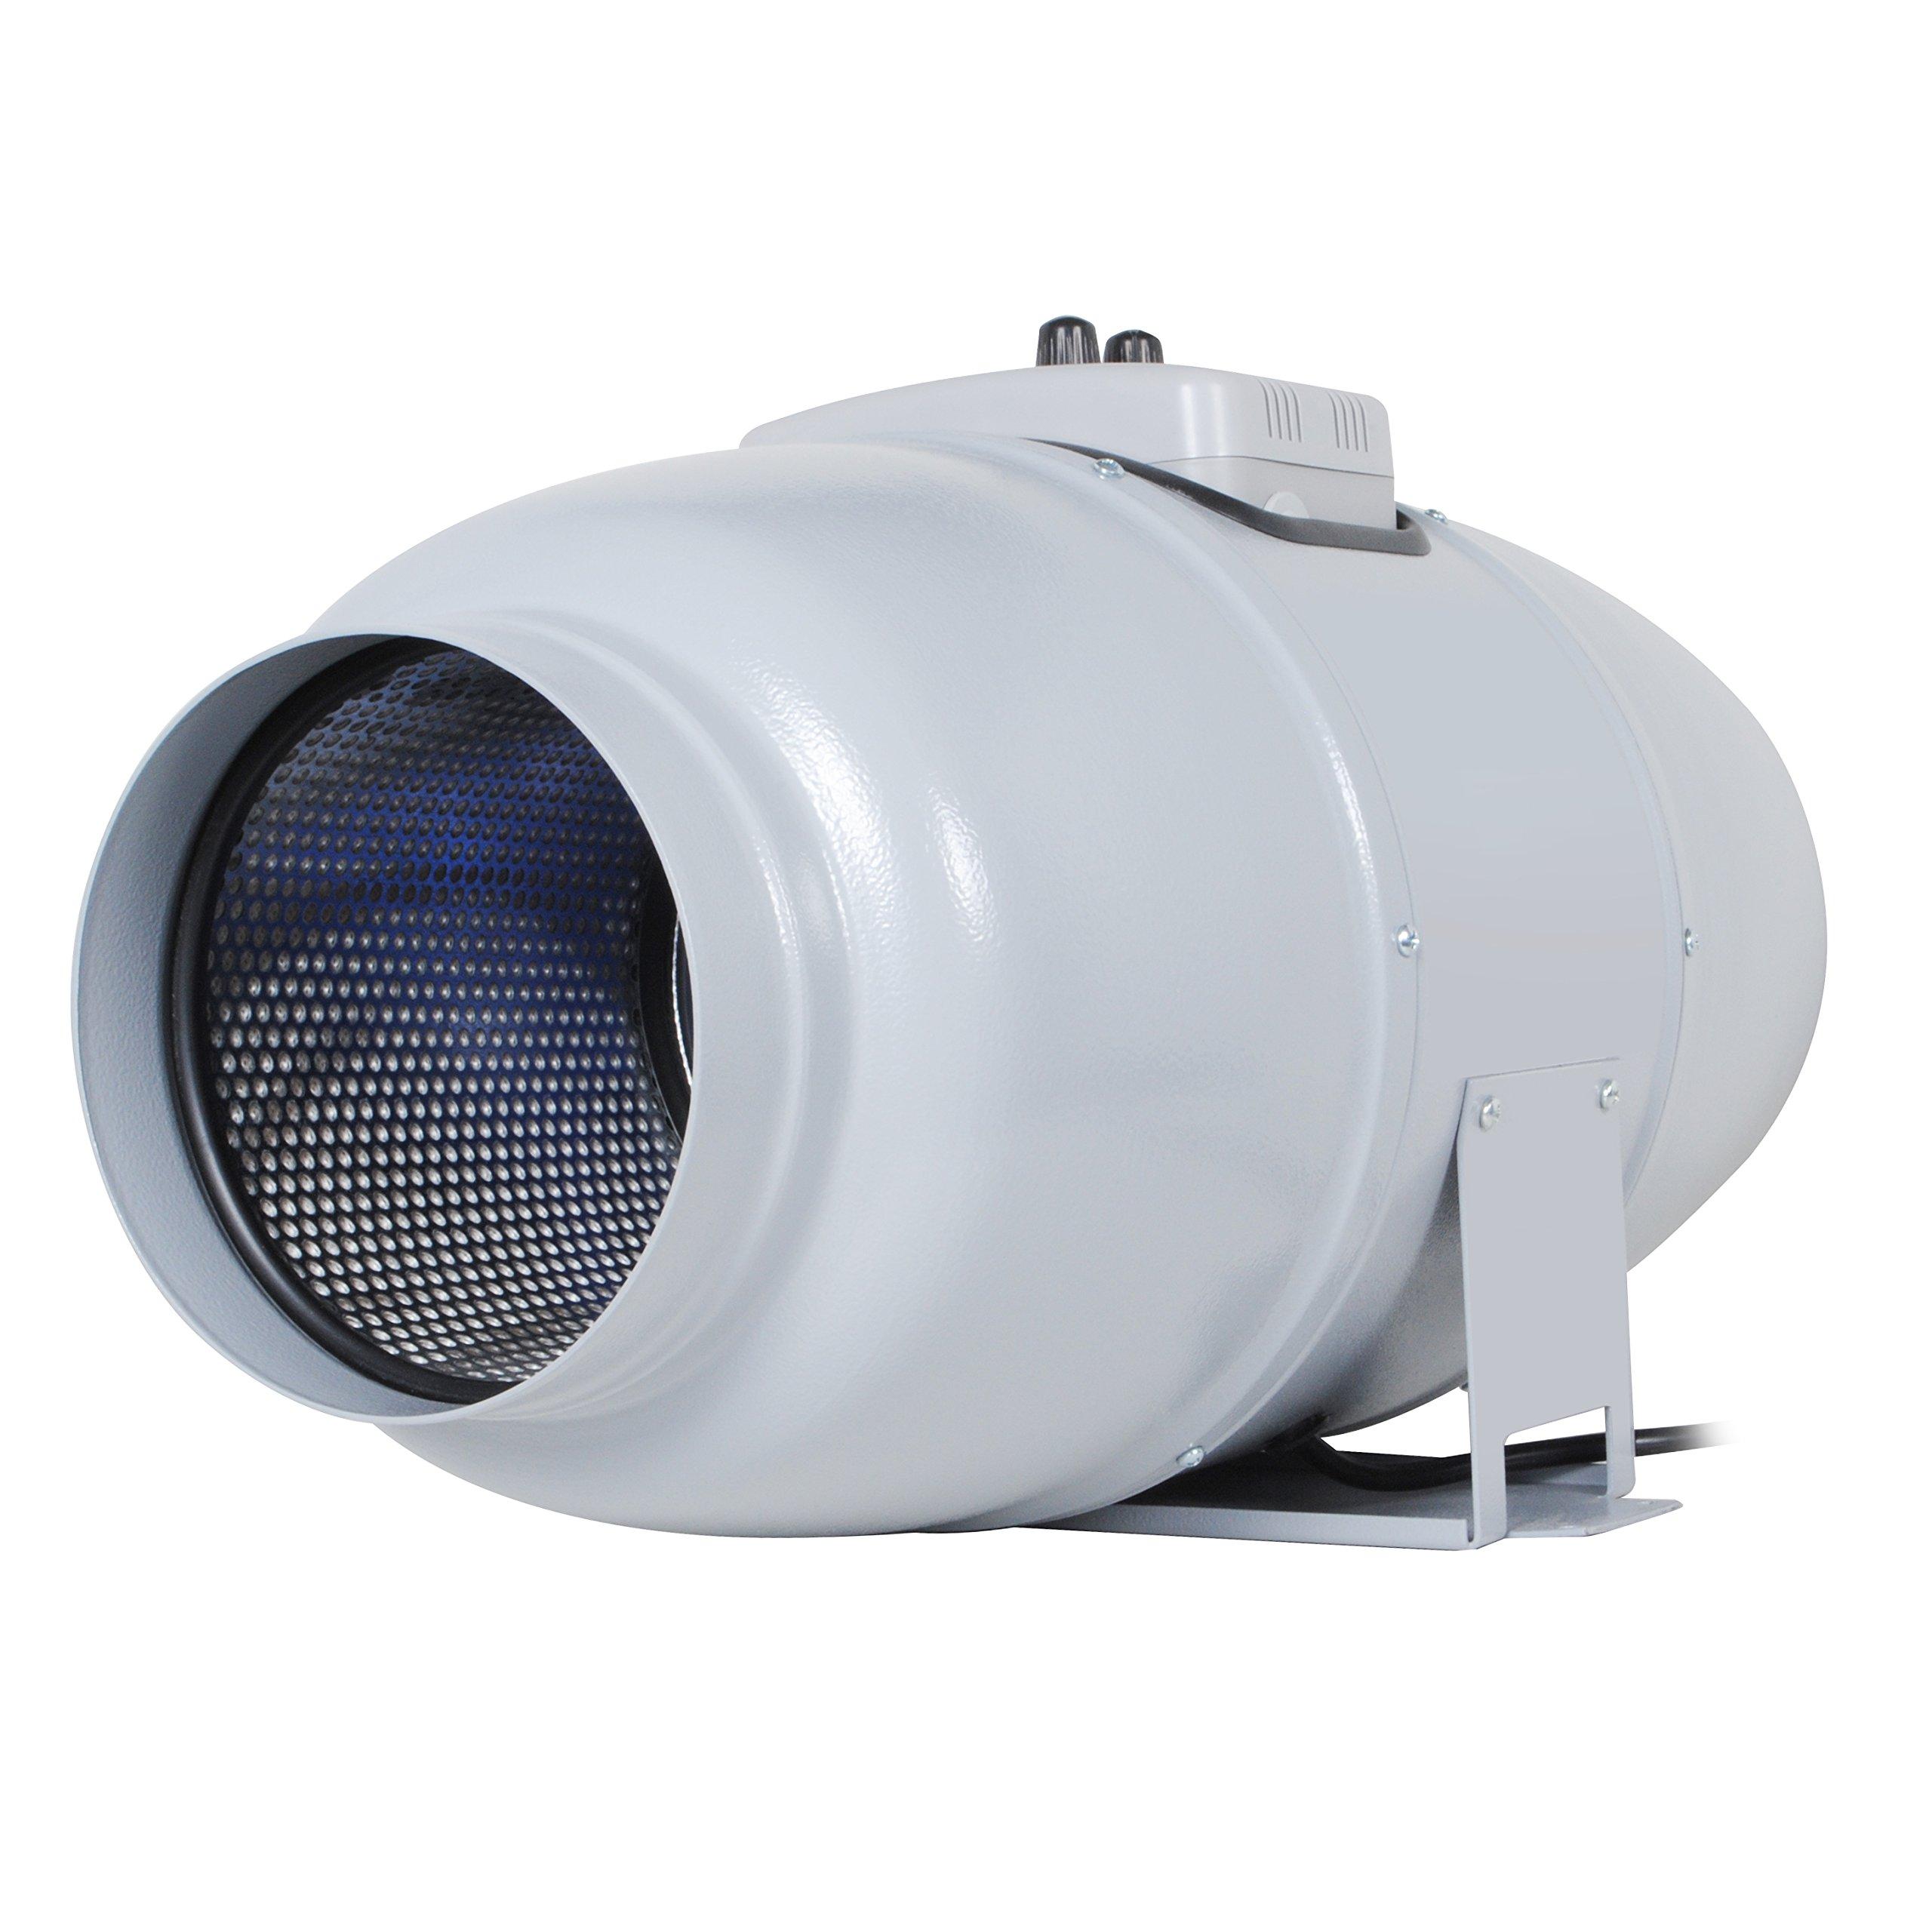 Best Rated in HVAC Fans & Circulators & Helpful Customer Reviews